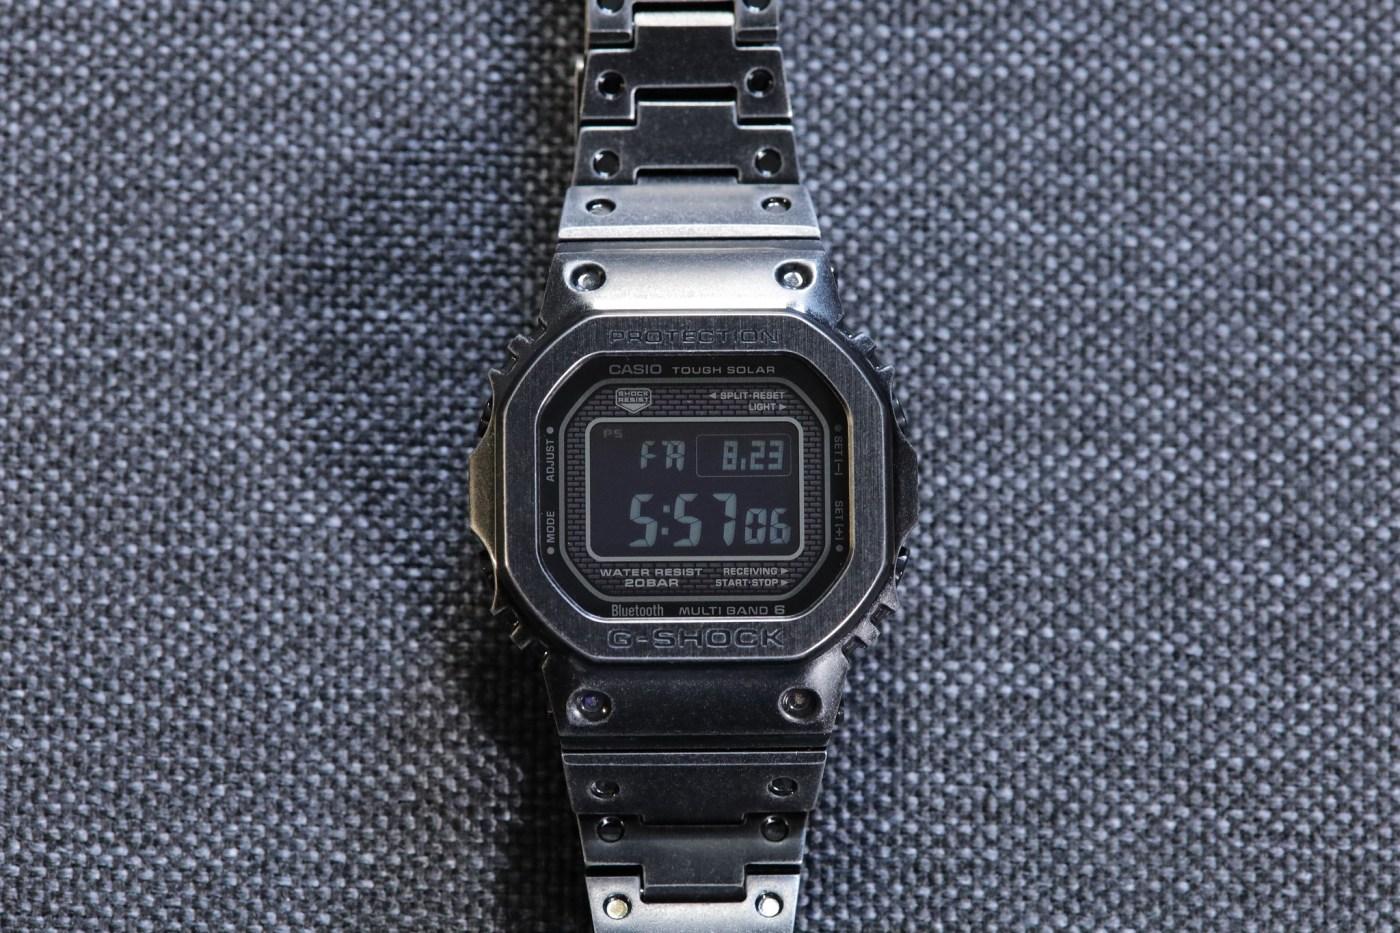 Casio G-Shock Full Metal 5000 Limited Edition 2019 GMWB5000V-1